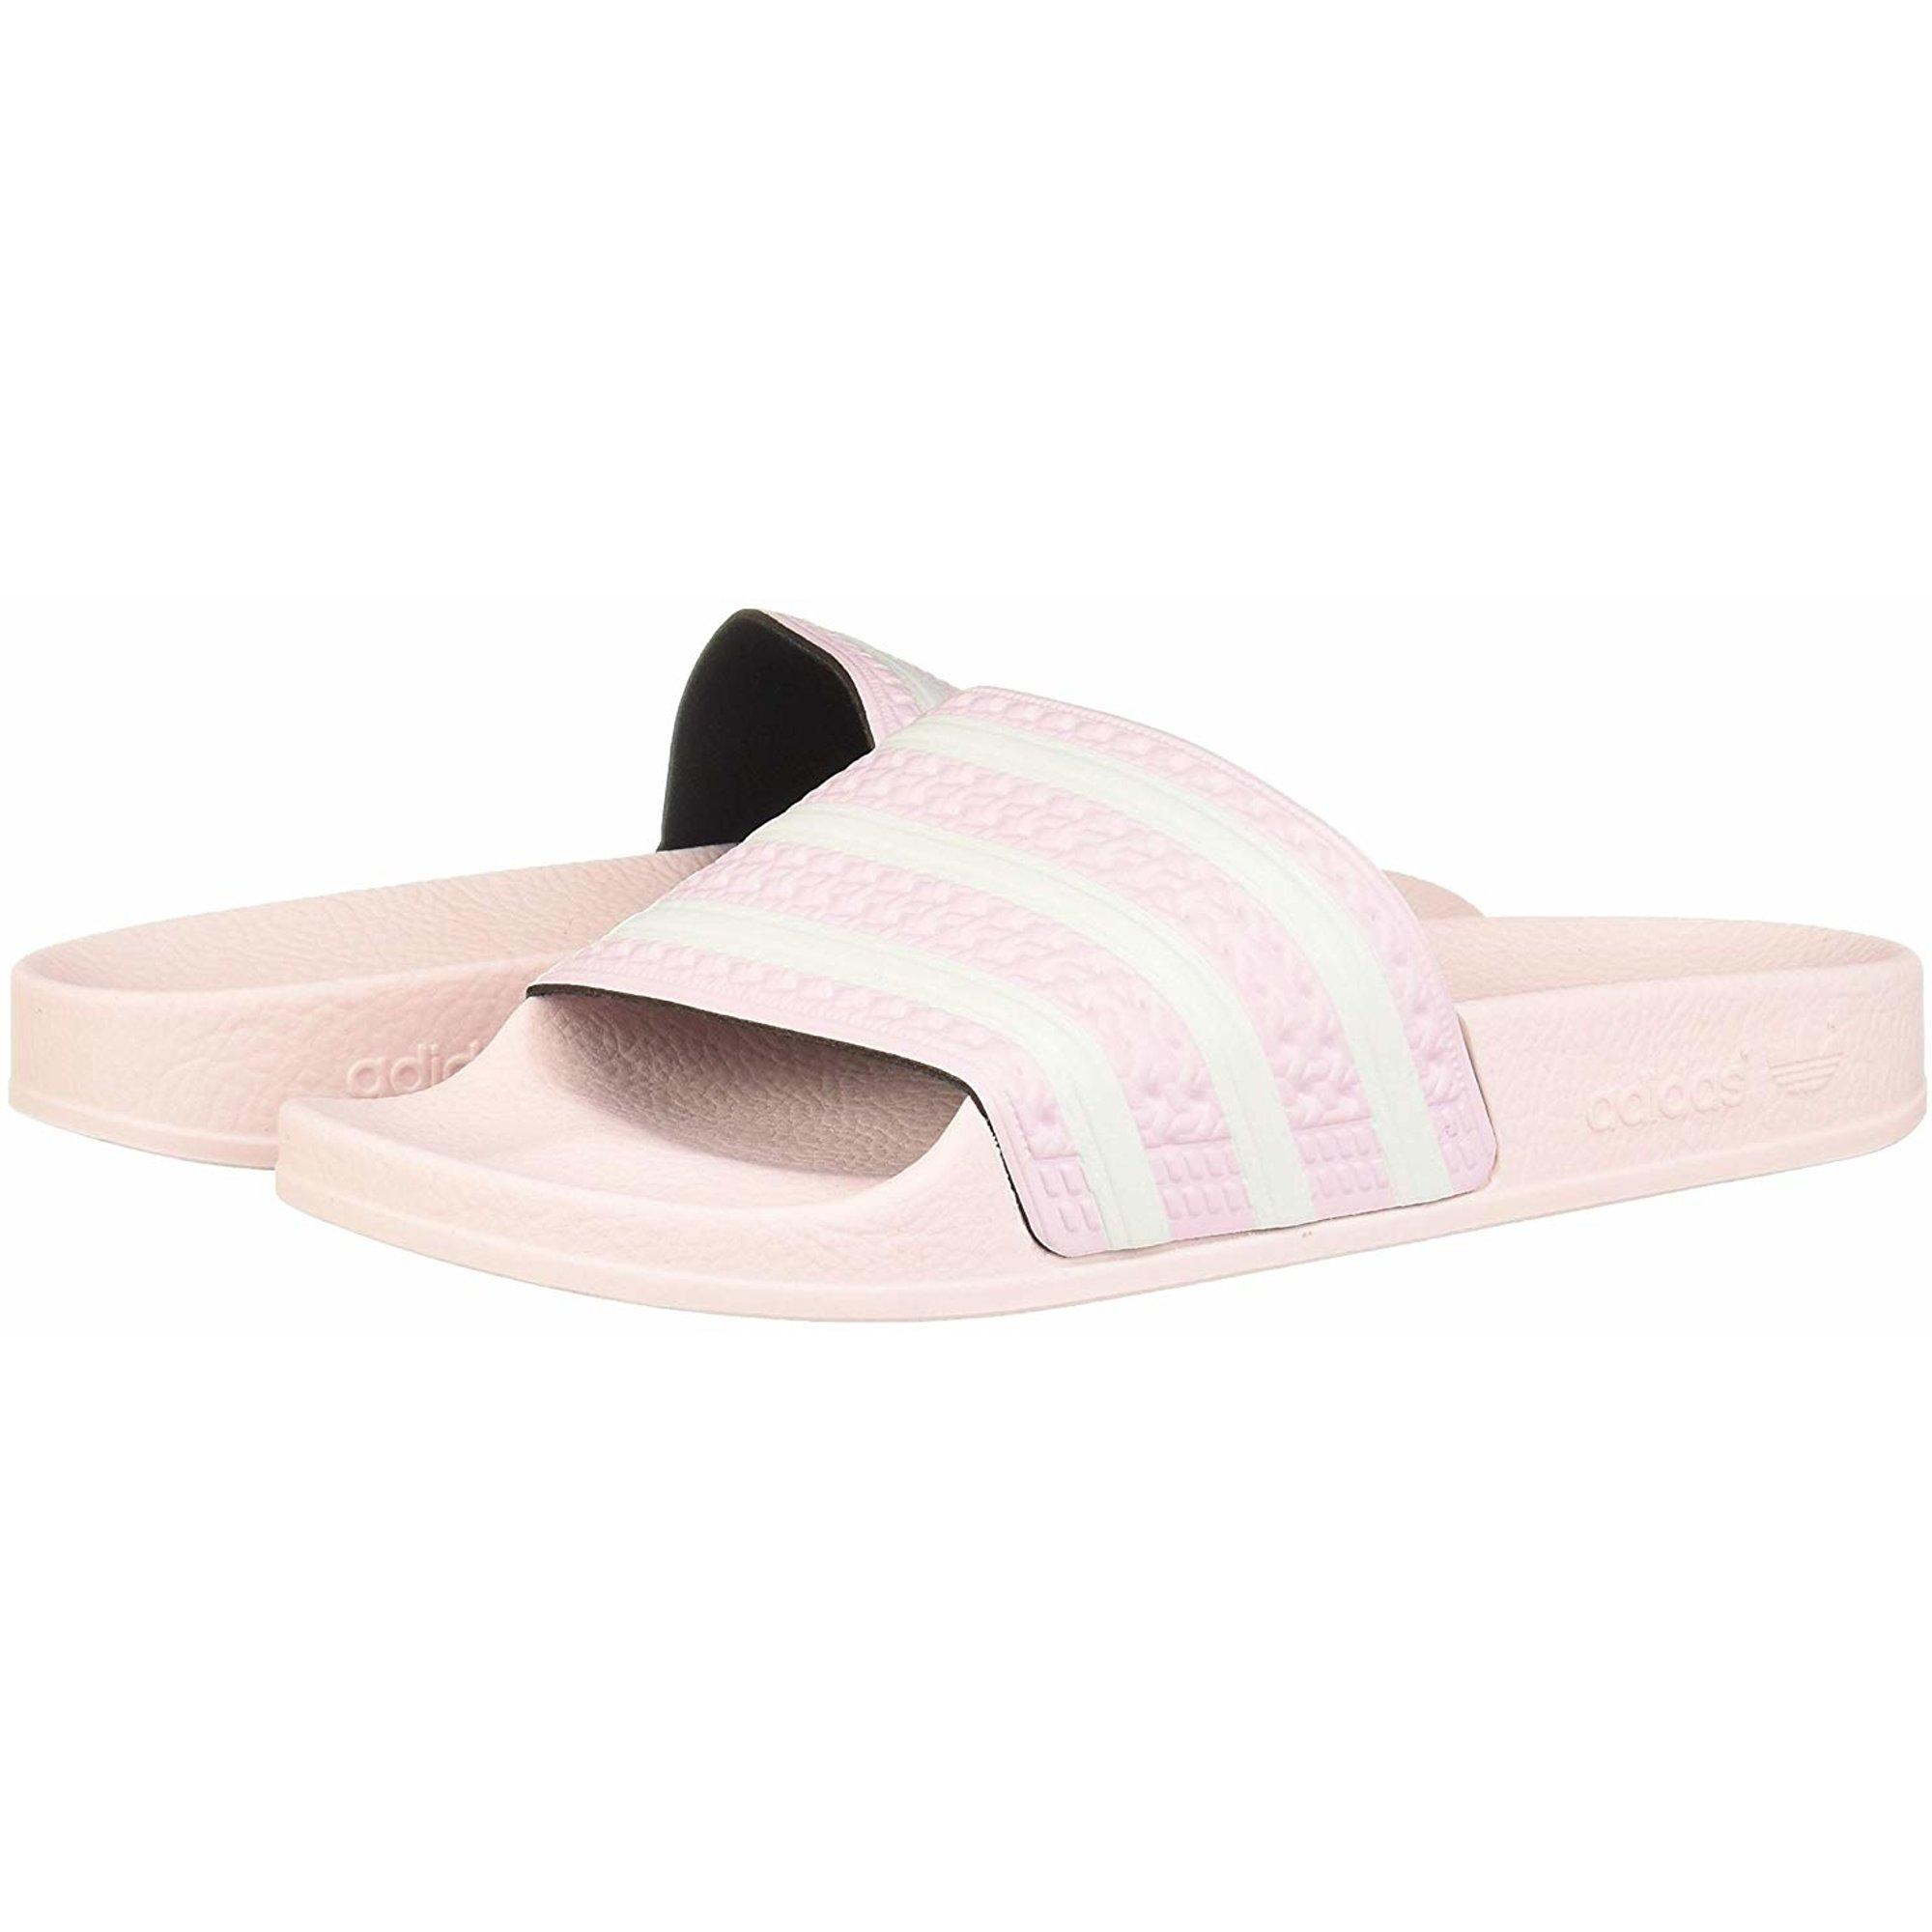 adidas dragon rosa palo